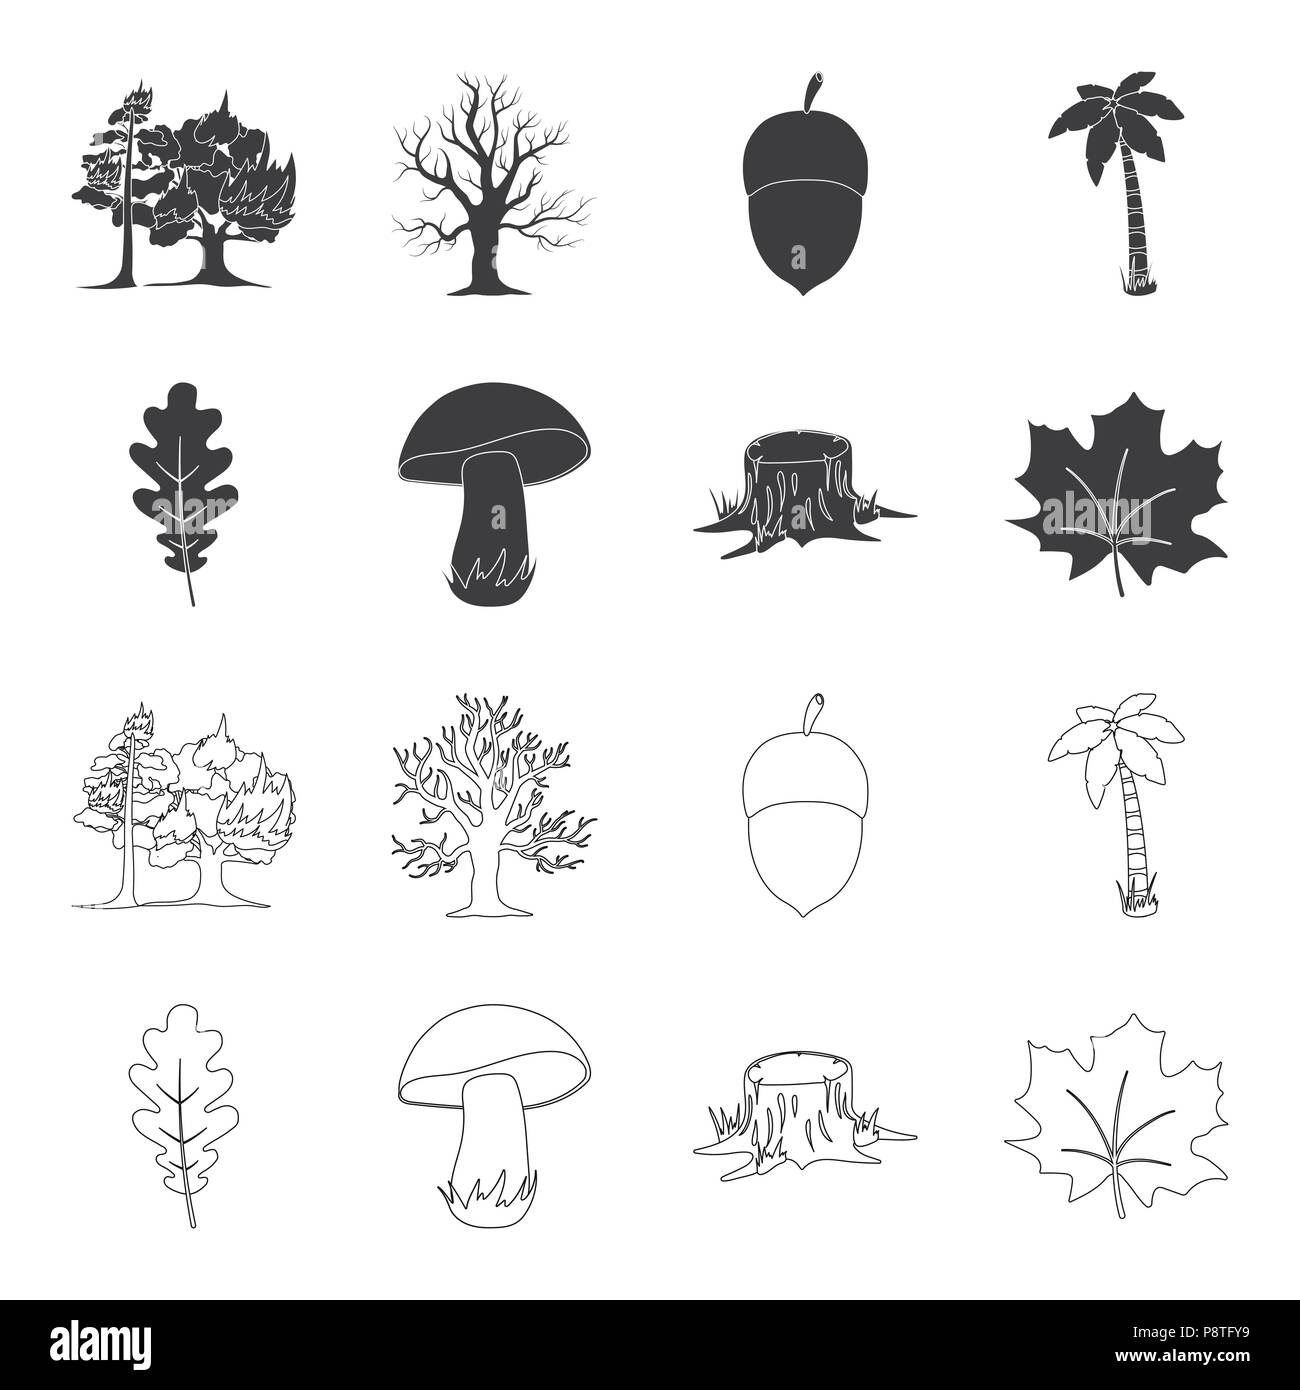 Oak Leaf Mushroom Stump Maple Leafrest Set Collection Icons In